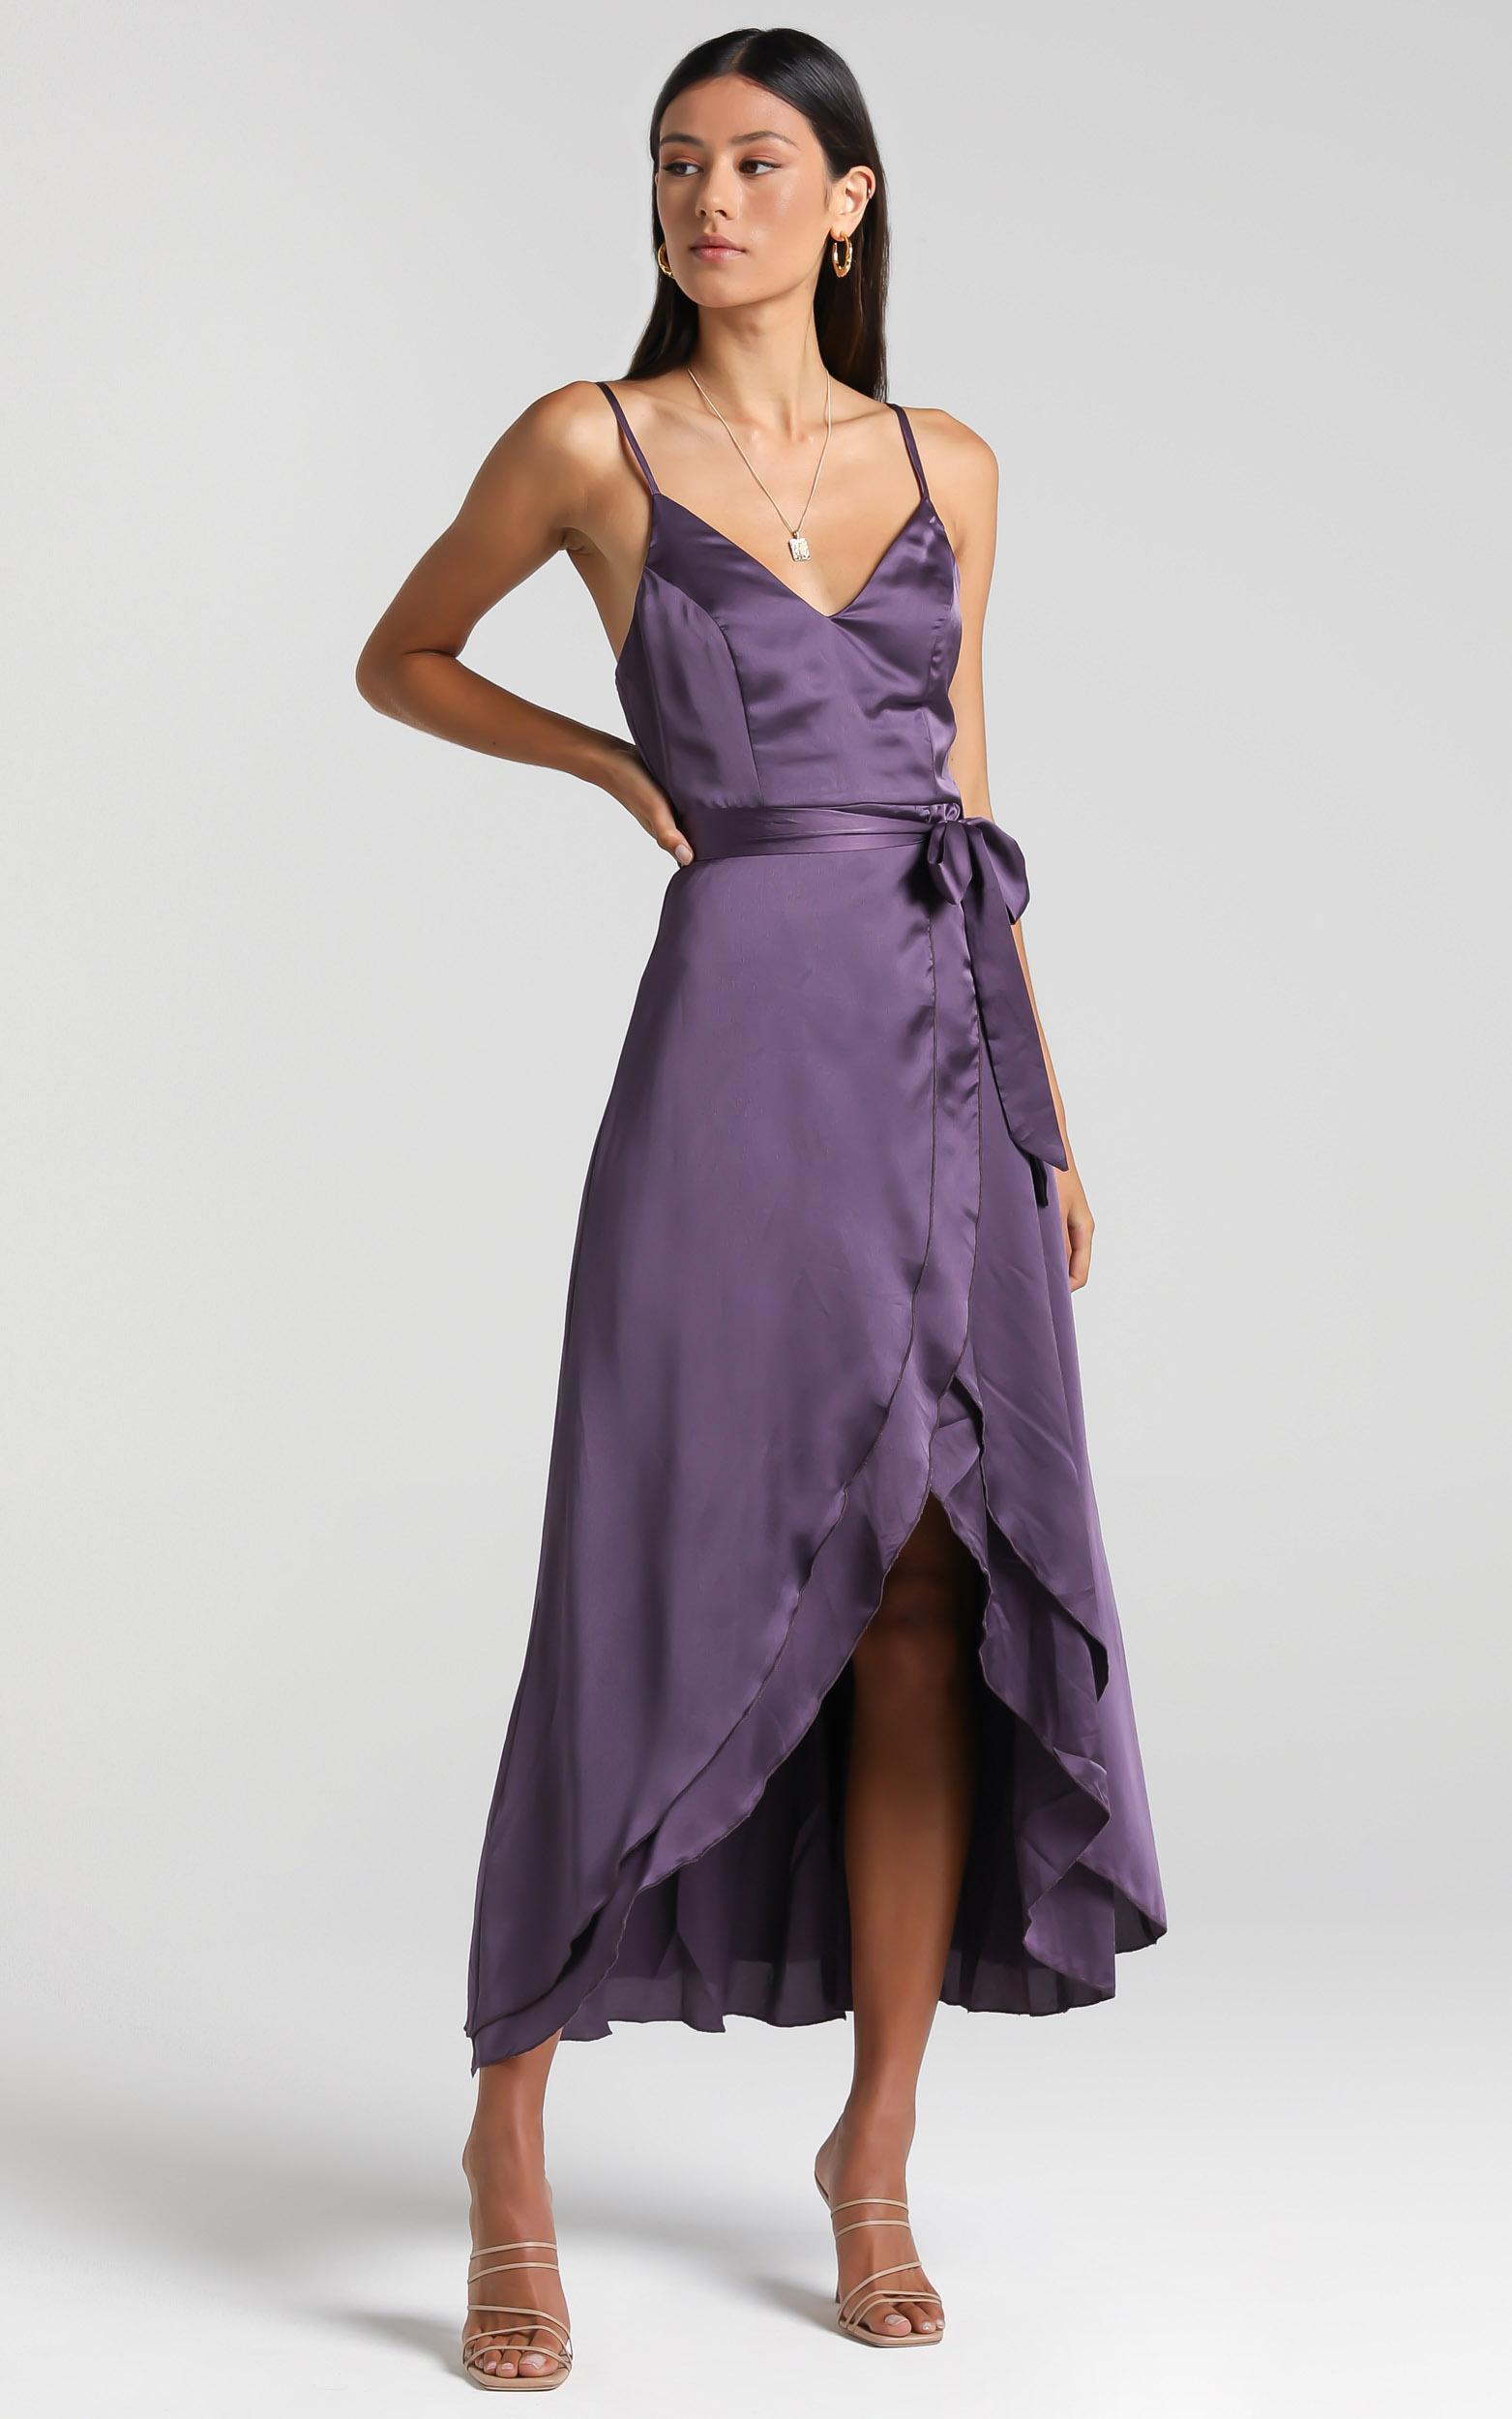 Treasuring You Wrap Midi Dress in Aubergine Satin - 06, PRP2, hi-res image number null